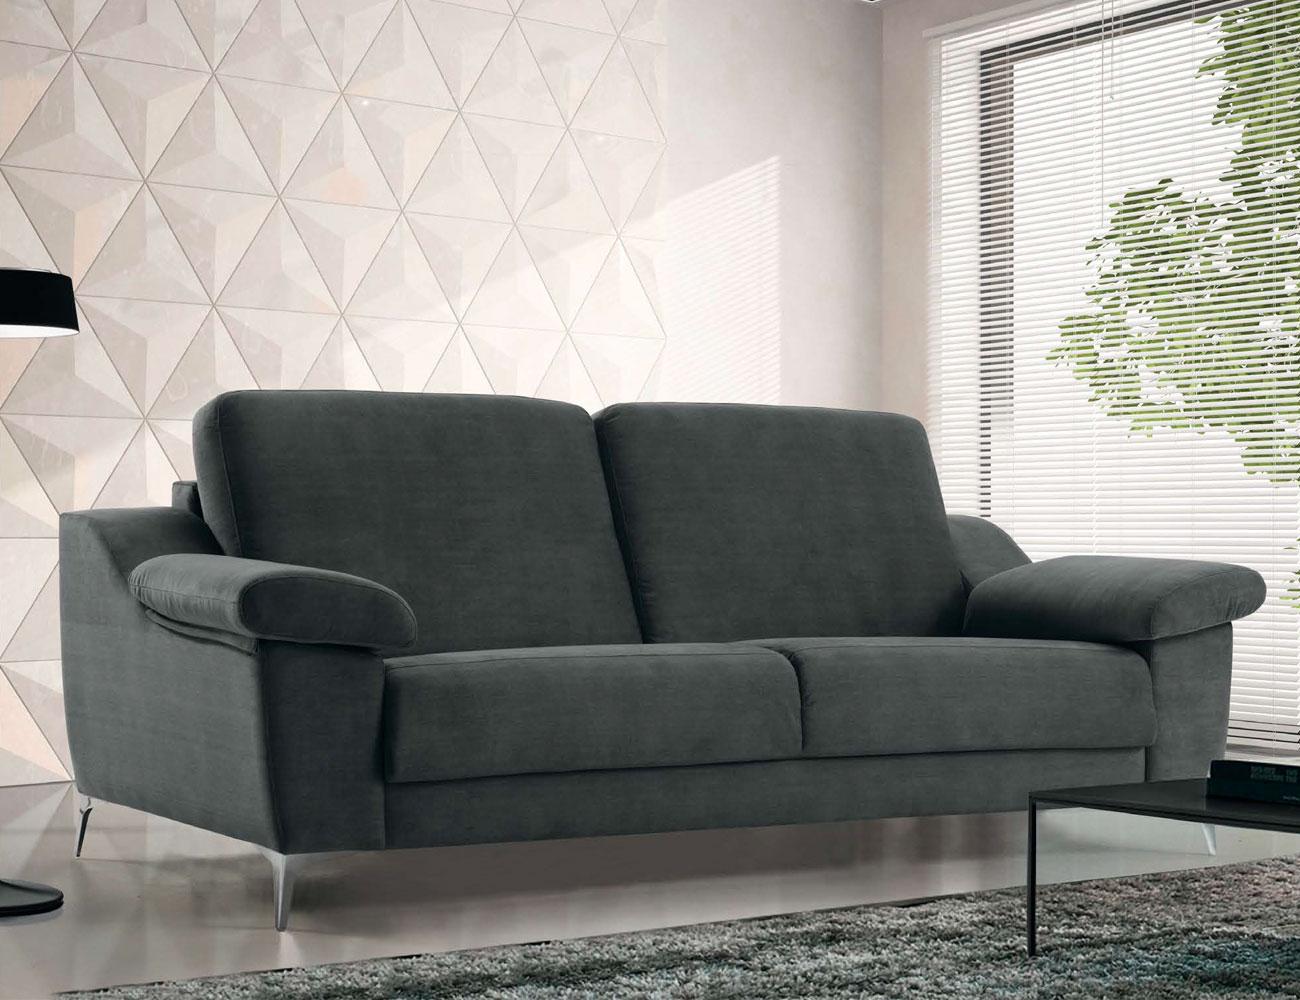 Sofa cama moderno apertura italiano marta